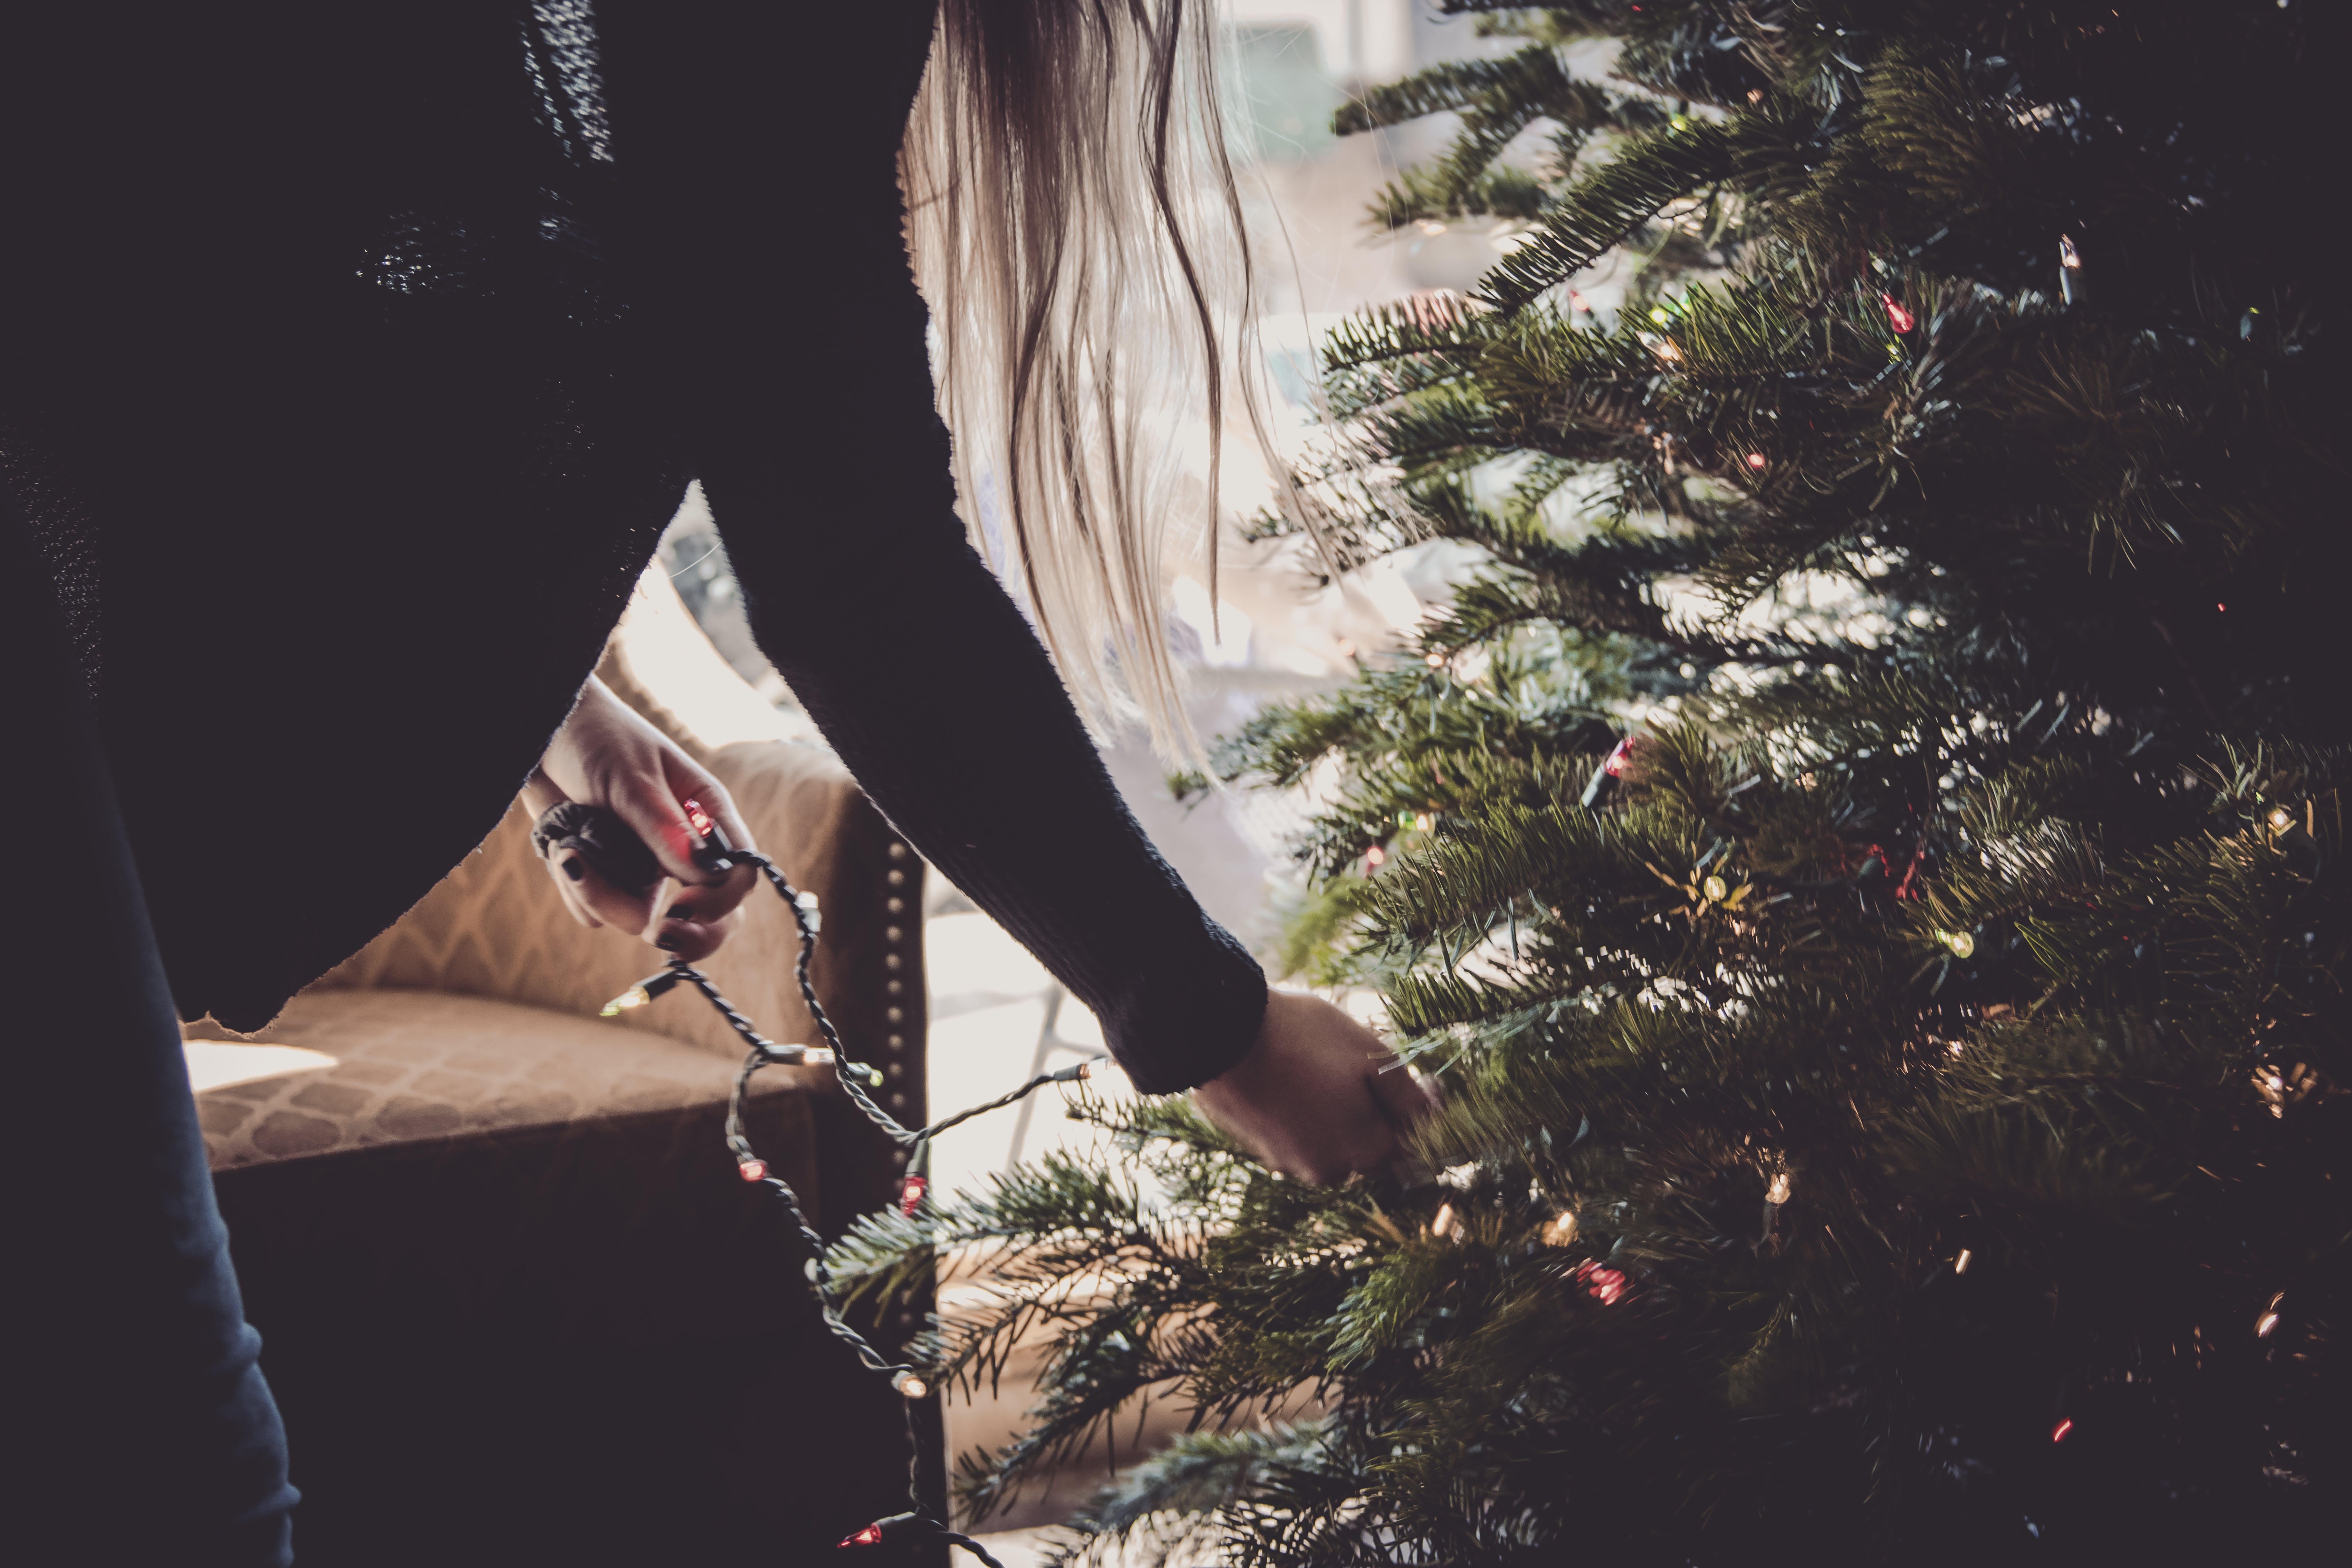 Woman Putting String Lights on Christmas Tree